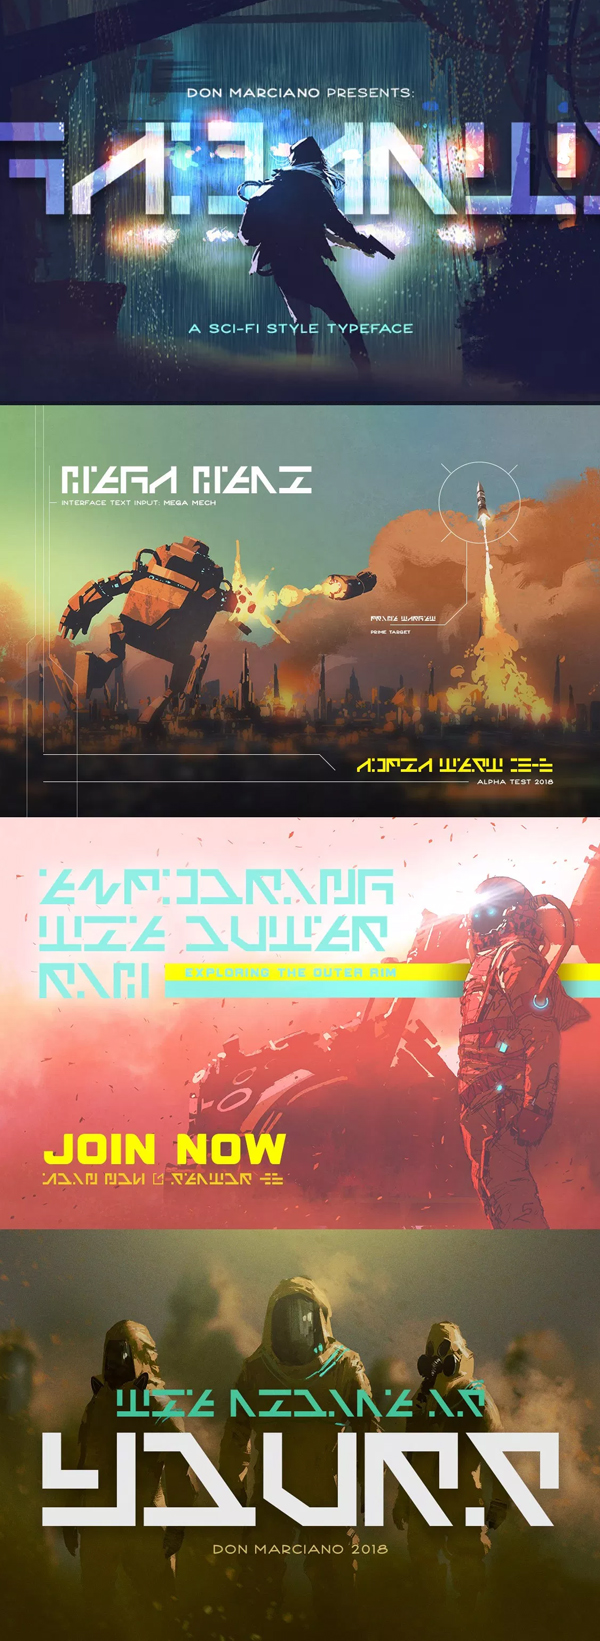 Galactico Sci-fi Free Font